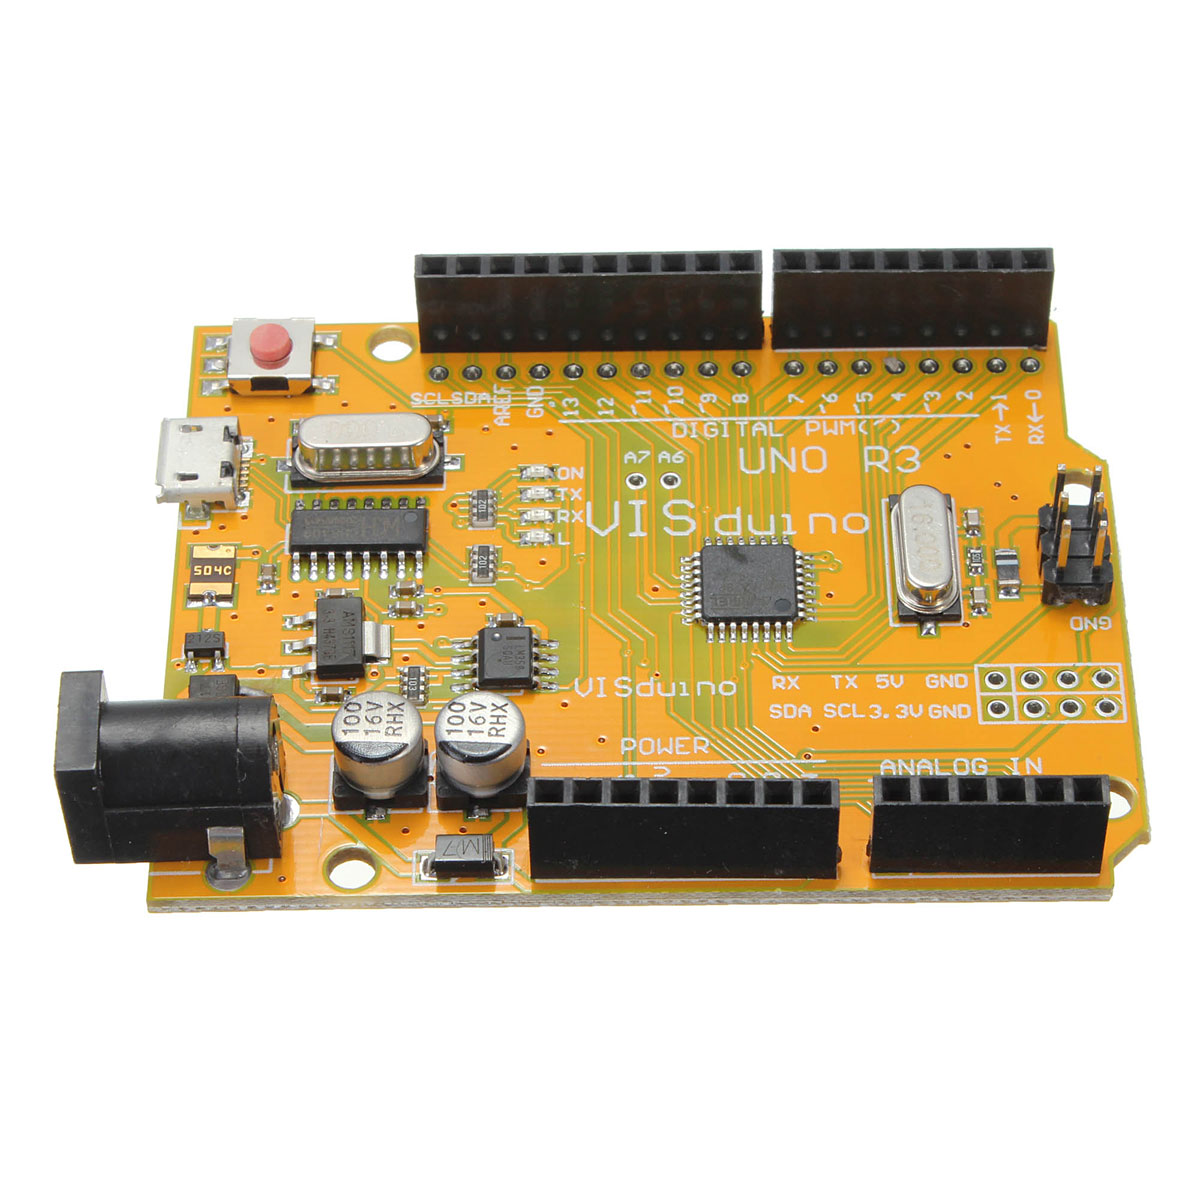 4x fdd120an15a0 Transistor N-MOSFET unipolar 150V 14A 65W DPAK